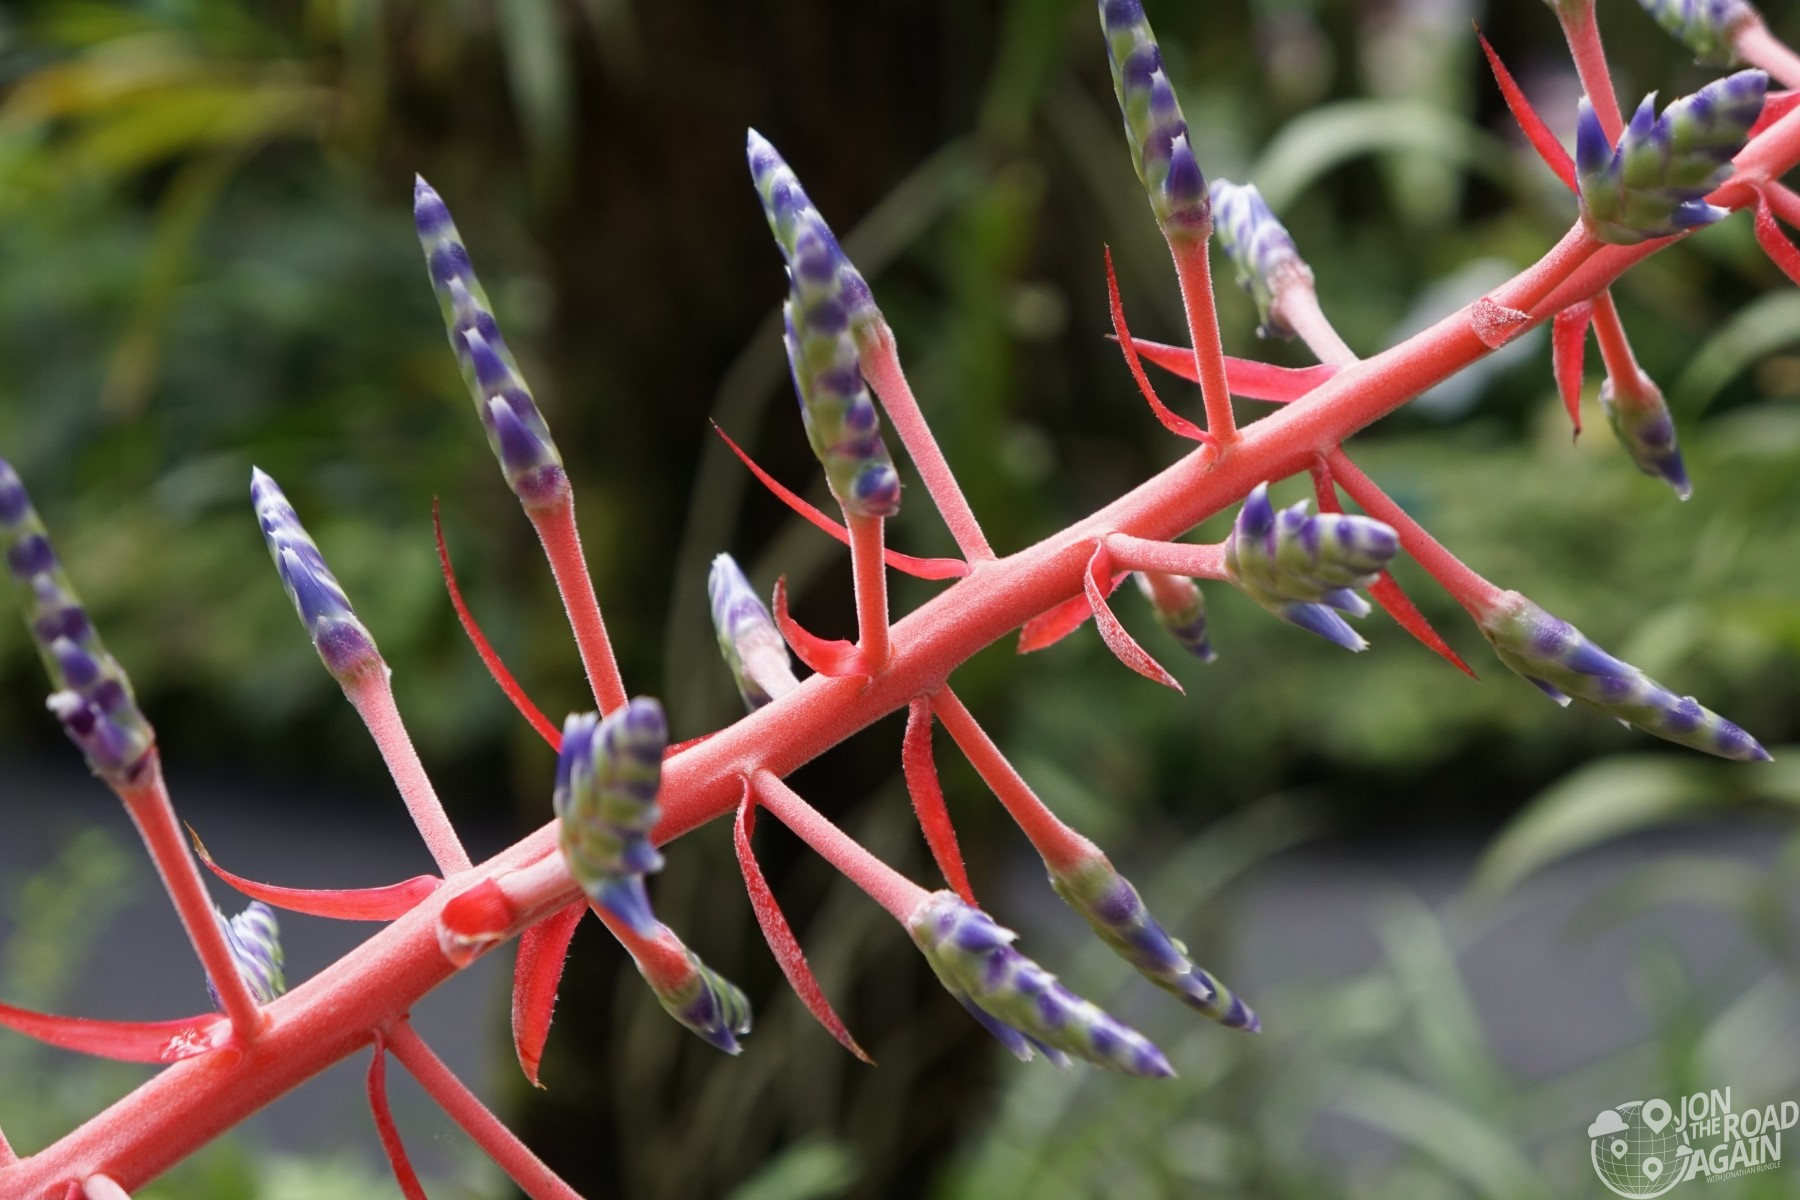 flower at Hawaii tropical botanical gardens